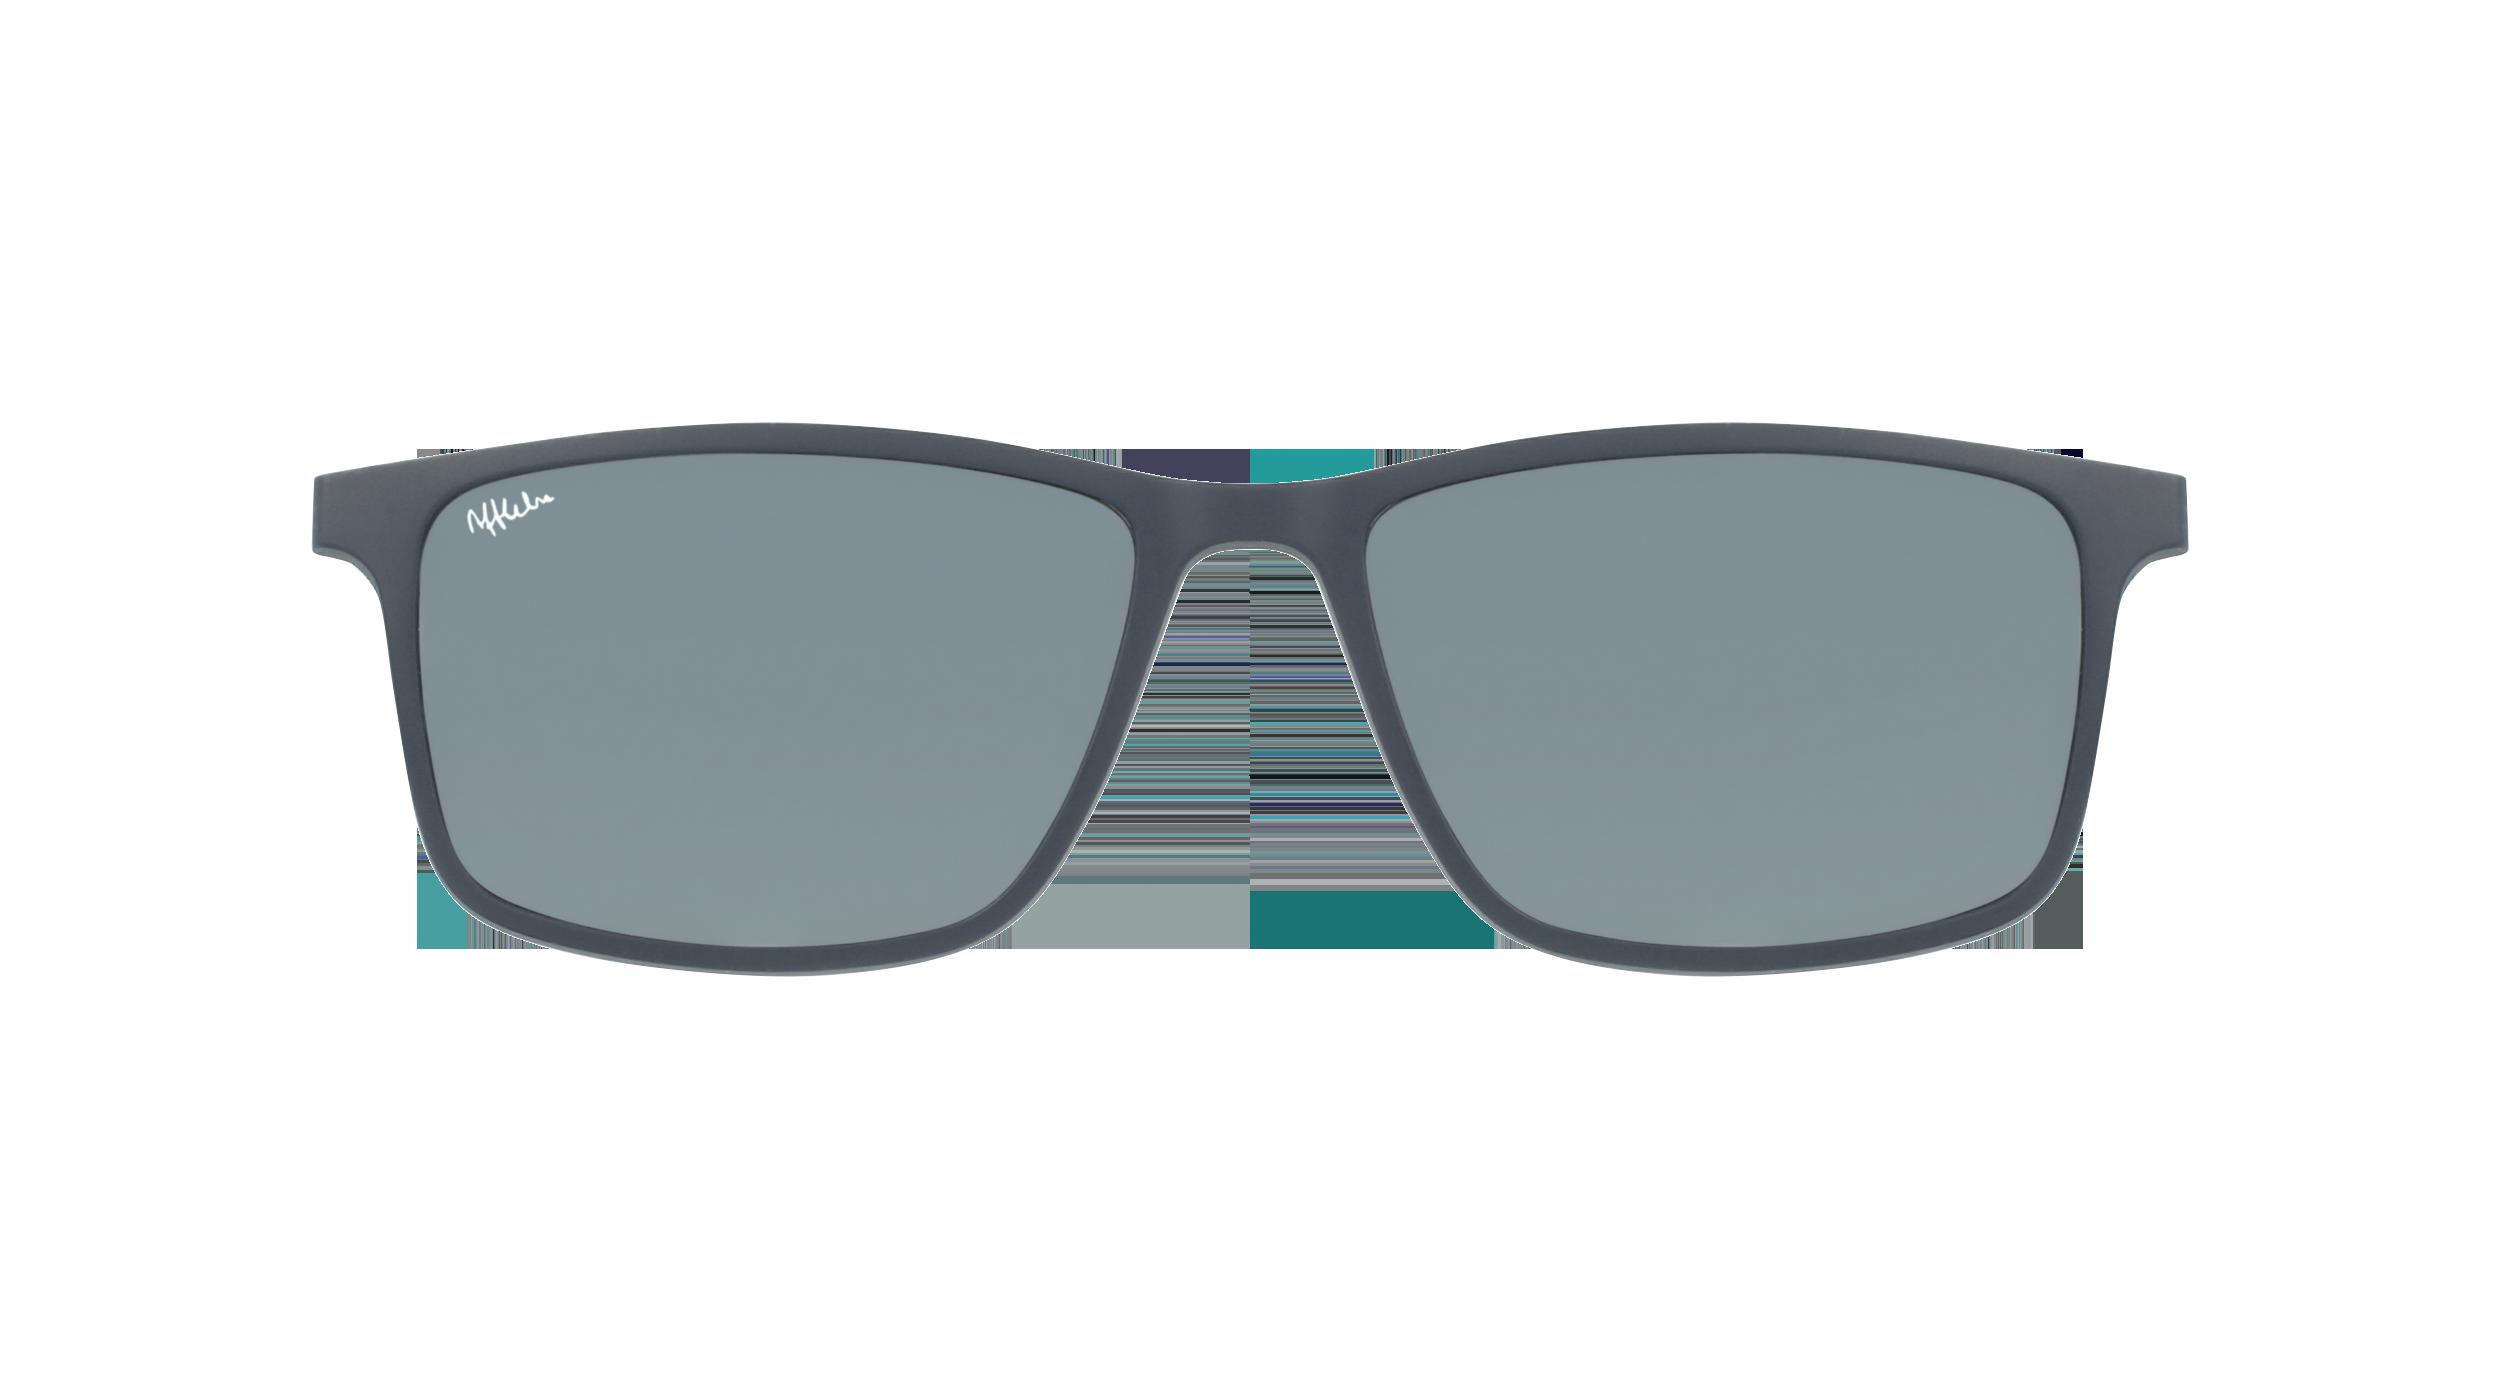 afflelou/france/products/smart_clip/clips_glasses/07630036456989.png